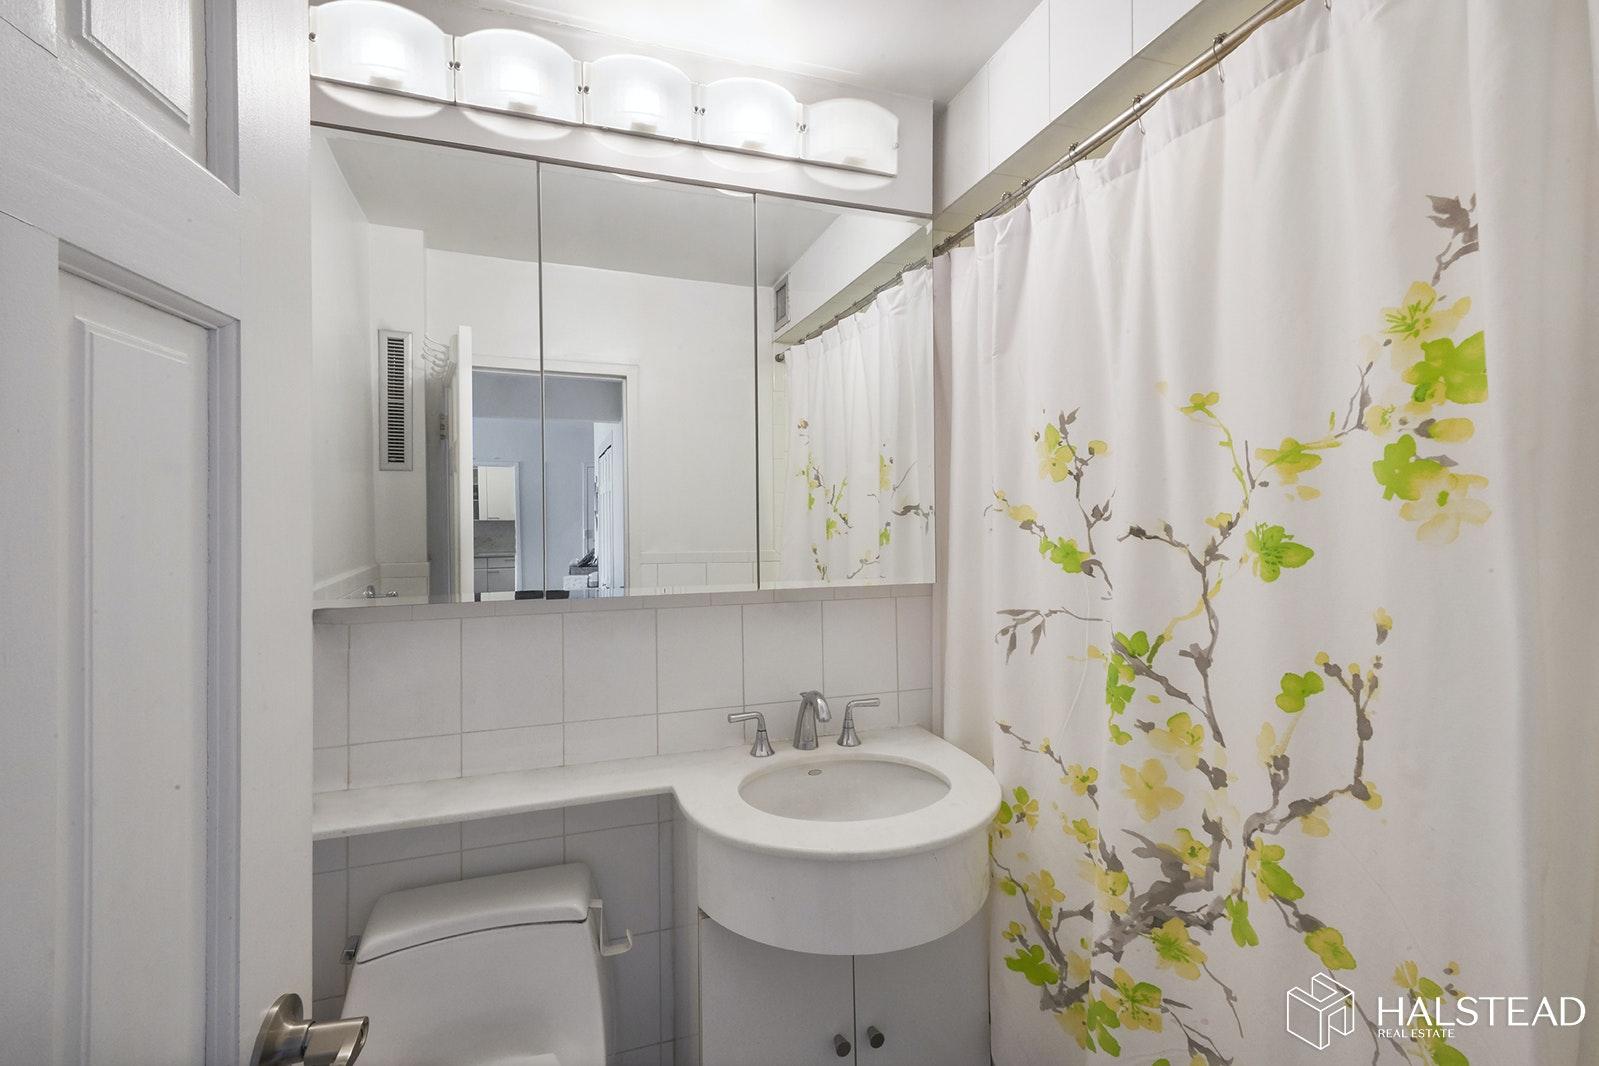 Apartment for sale at 392 Central Park West, Apt 18AB